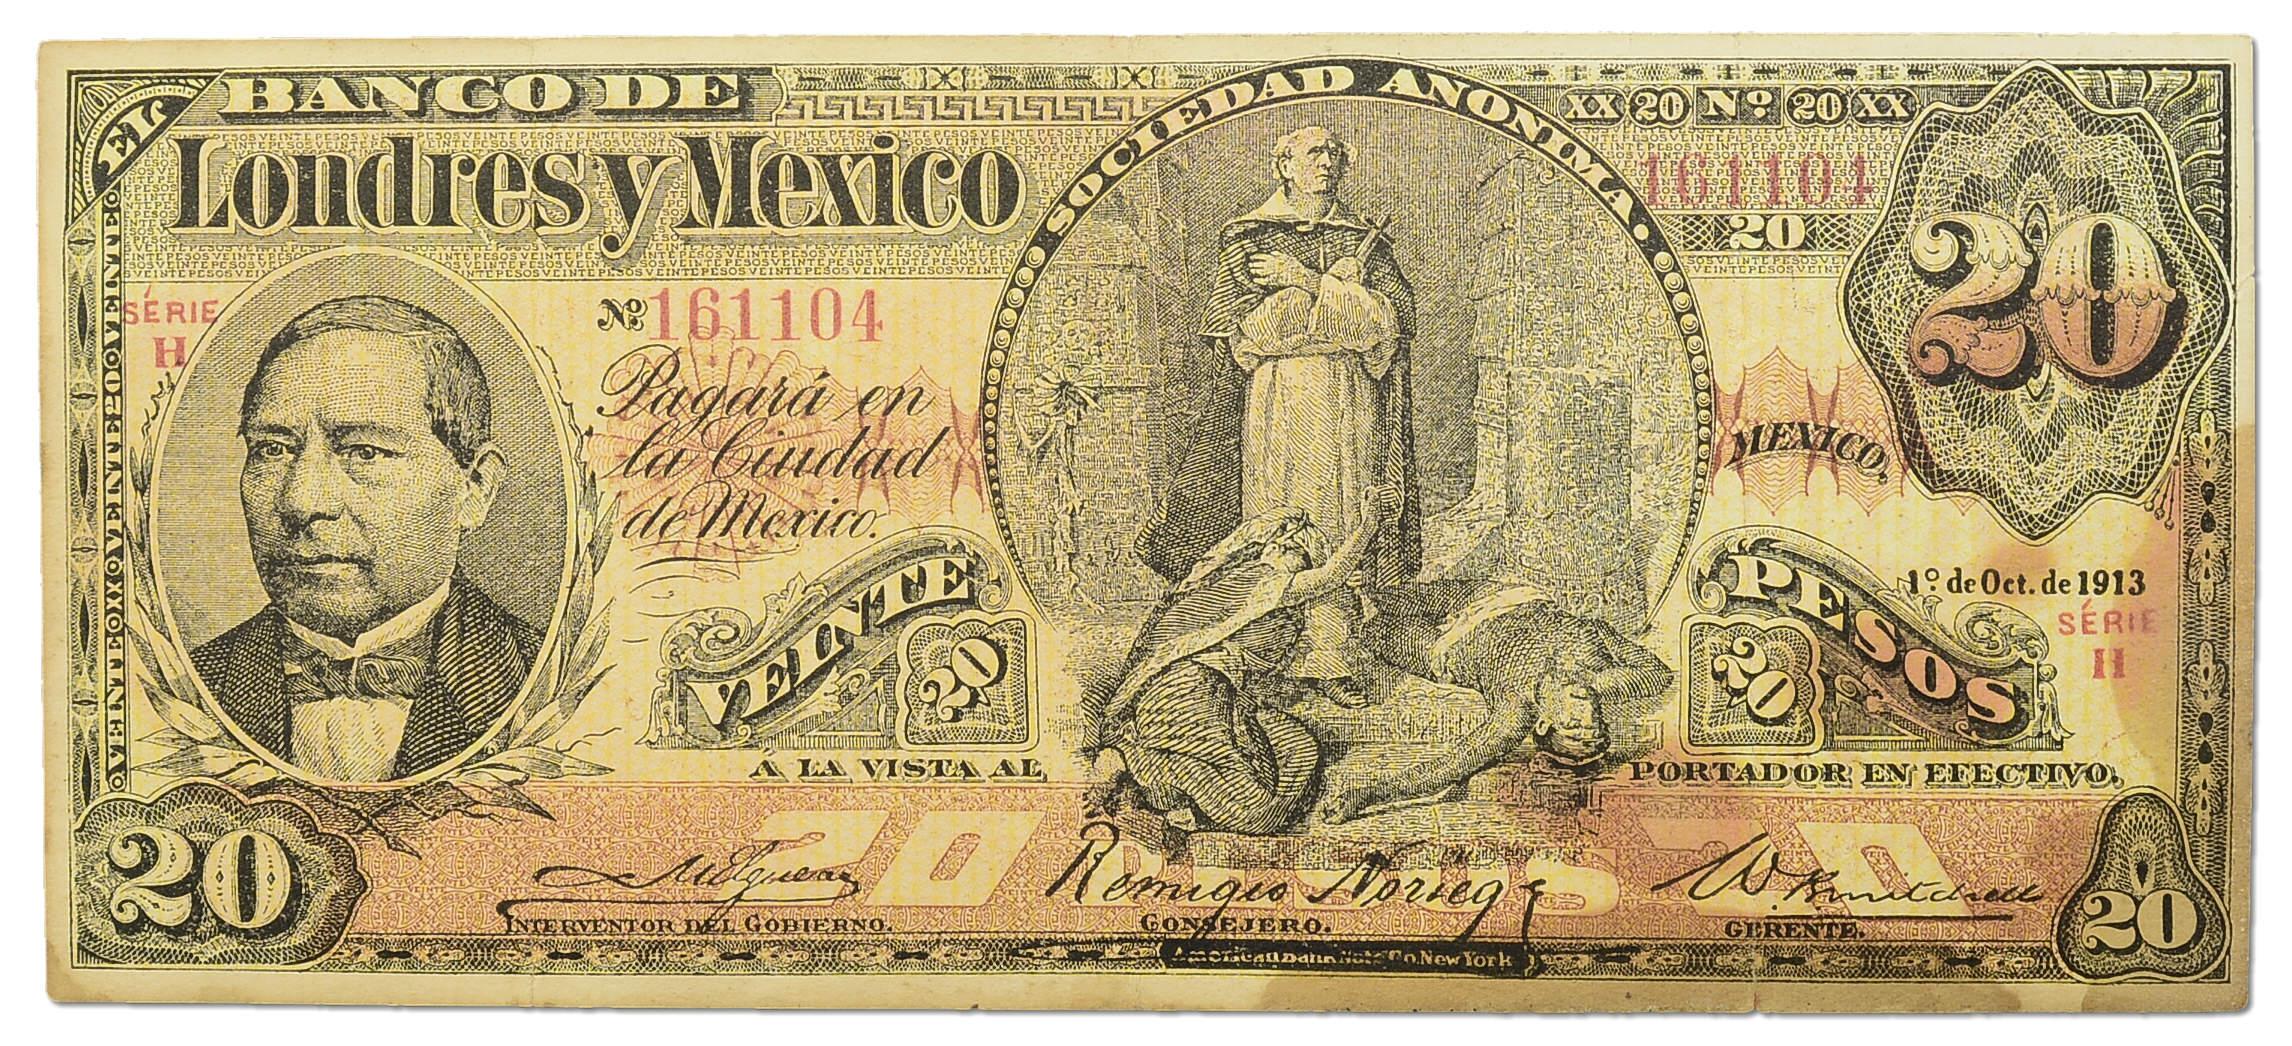 4.Meksyk, 20 Pesos 1913 rzadki, P.S235.d, St.3-